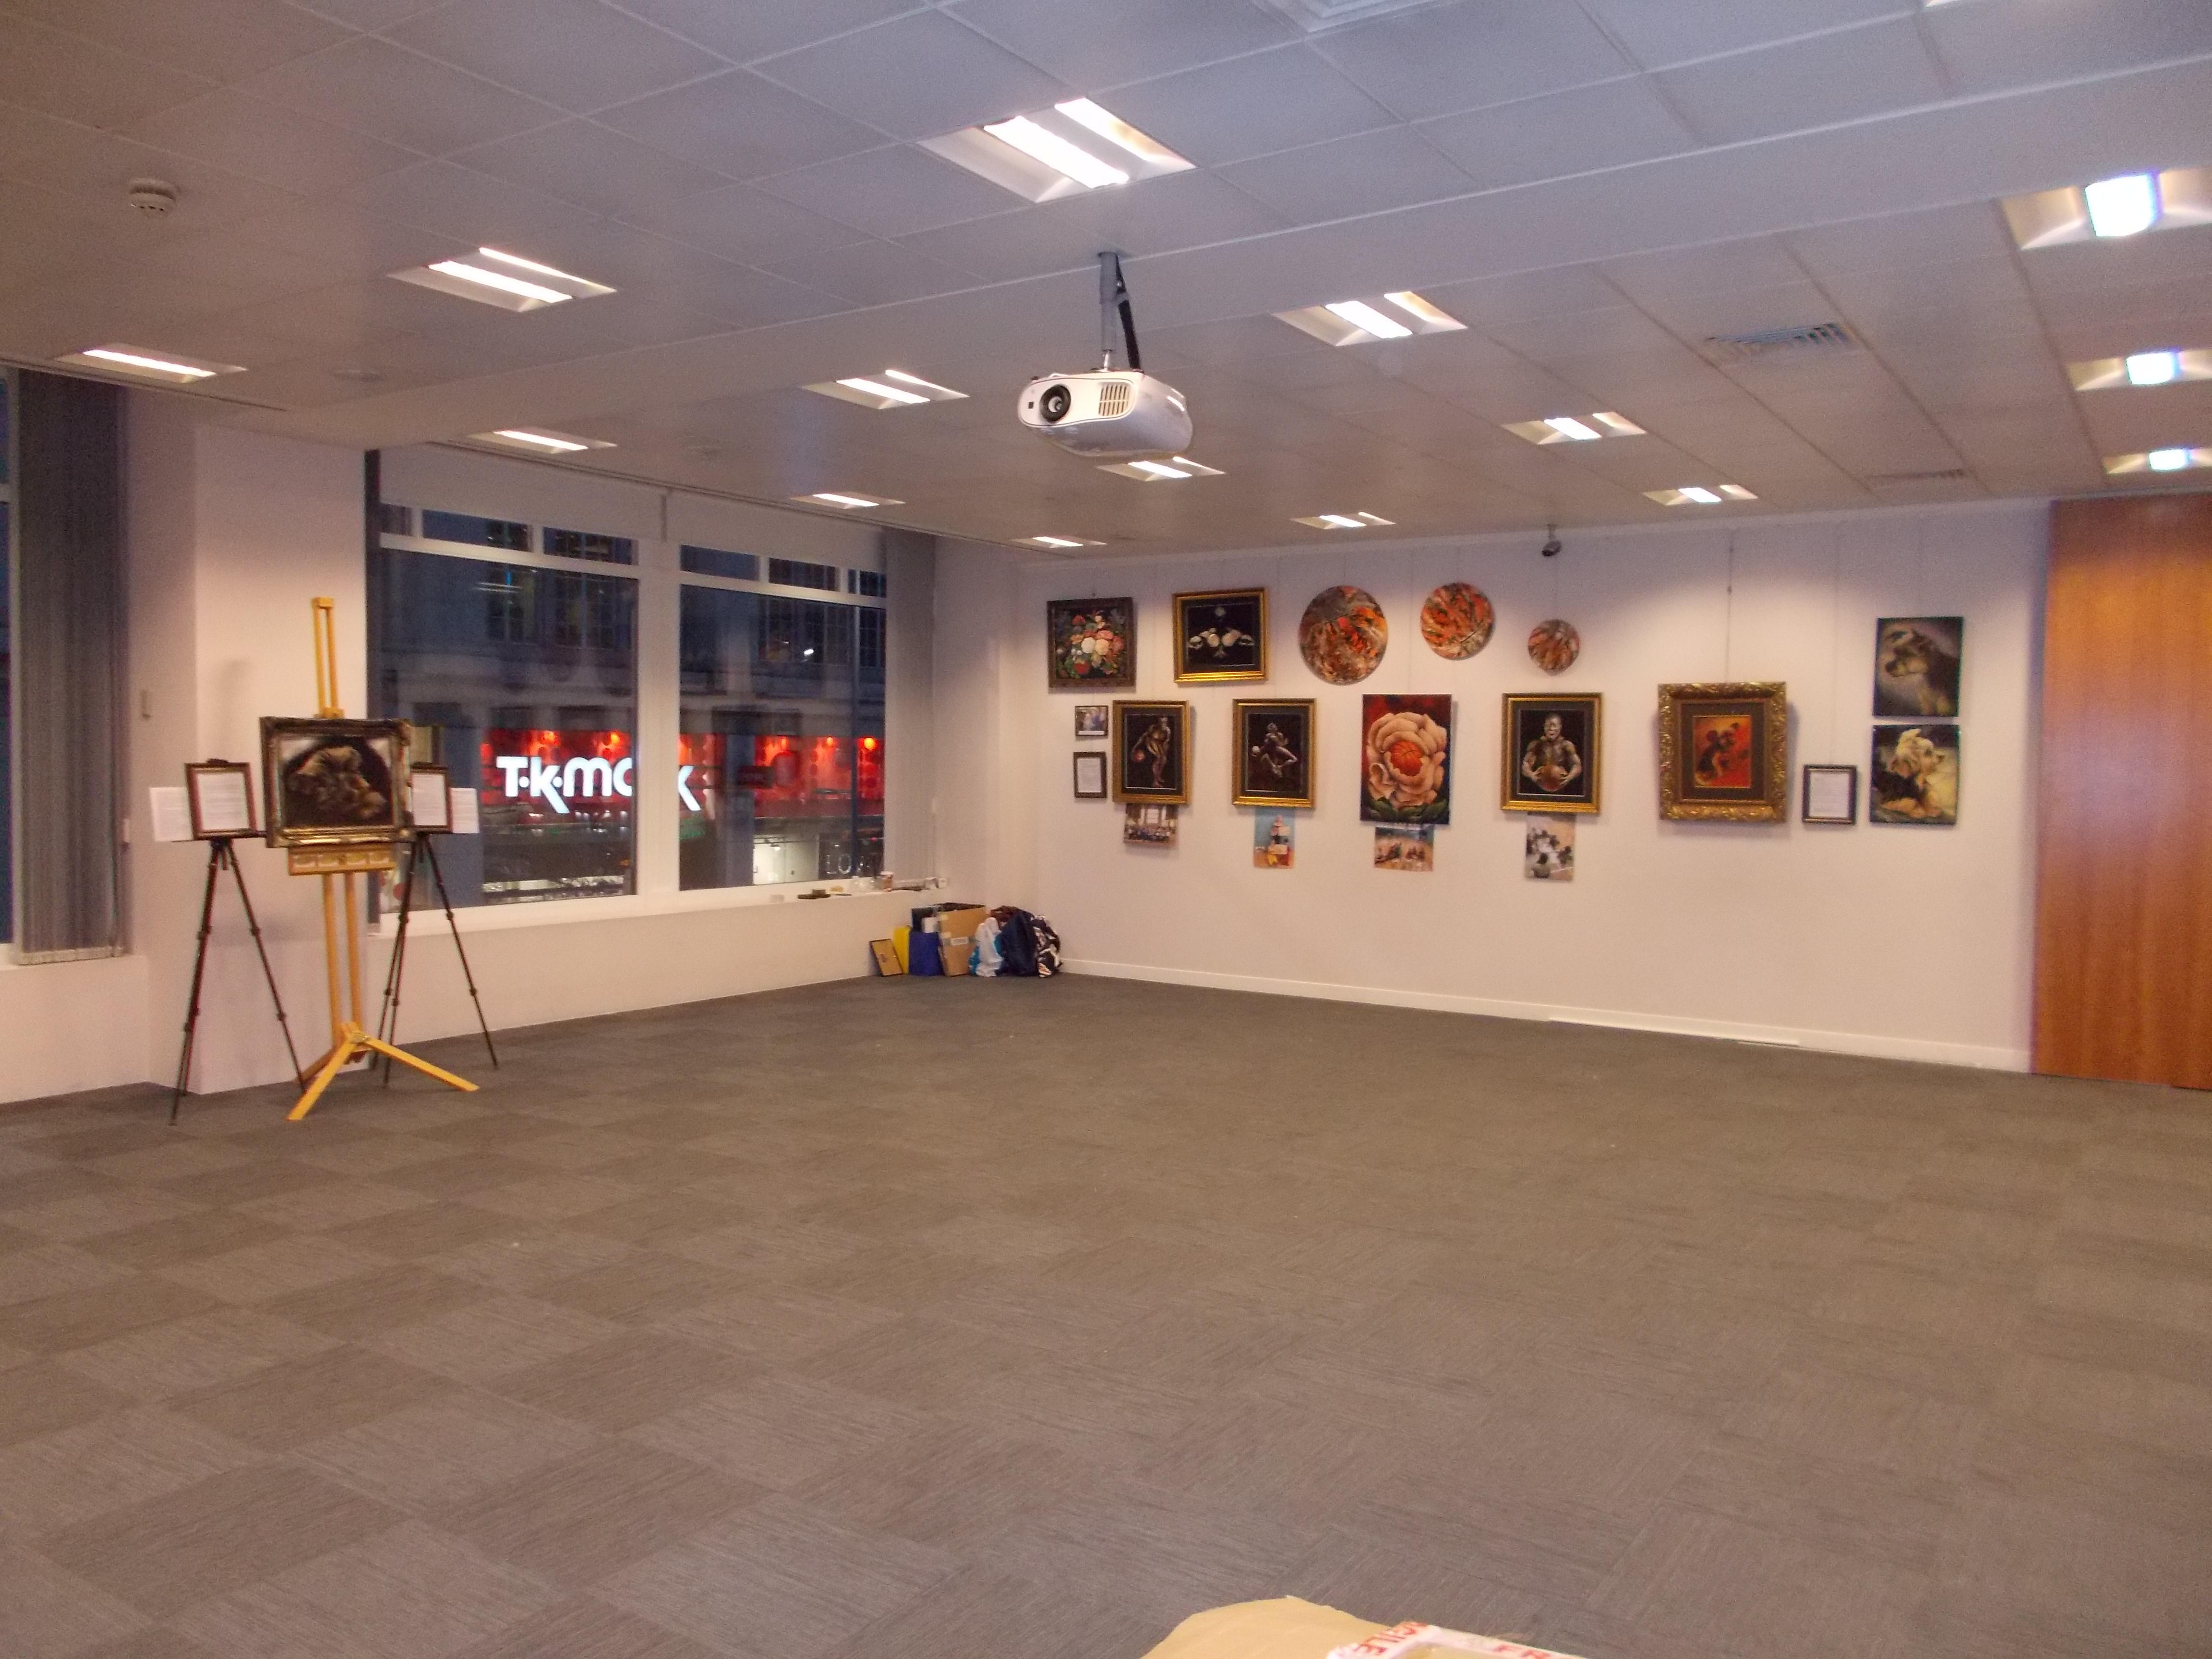 1-2 jurita-art and basketball- exhibition 12-22 november 2019 in Rossotrudnichestvo London (9)